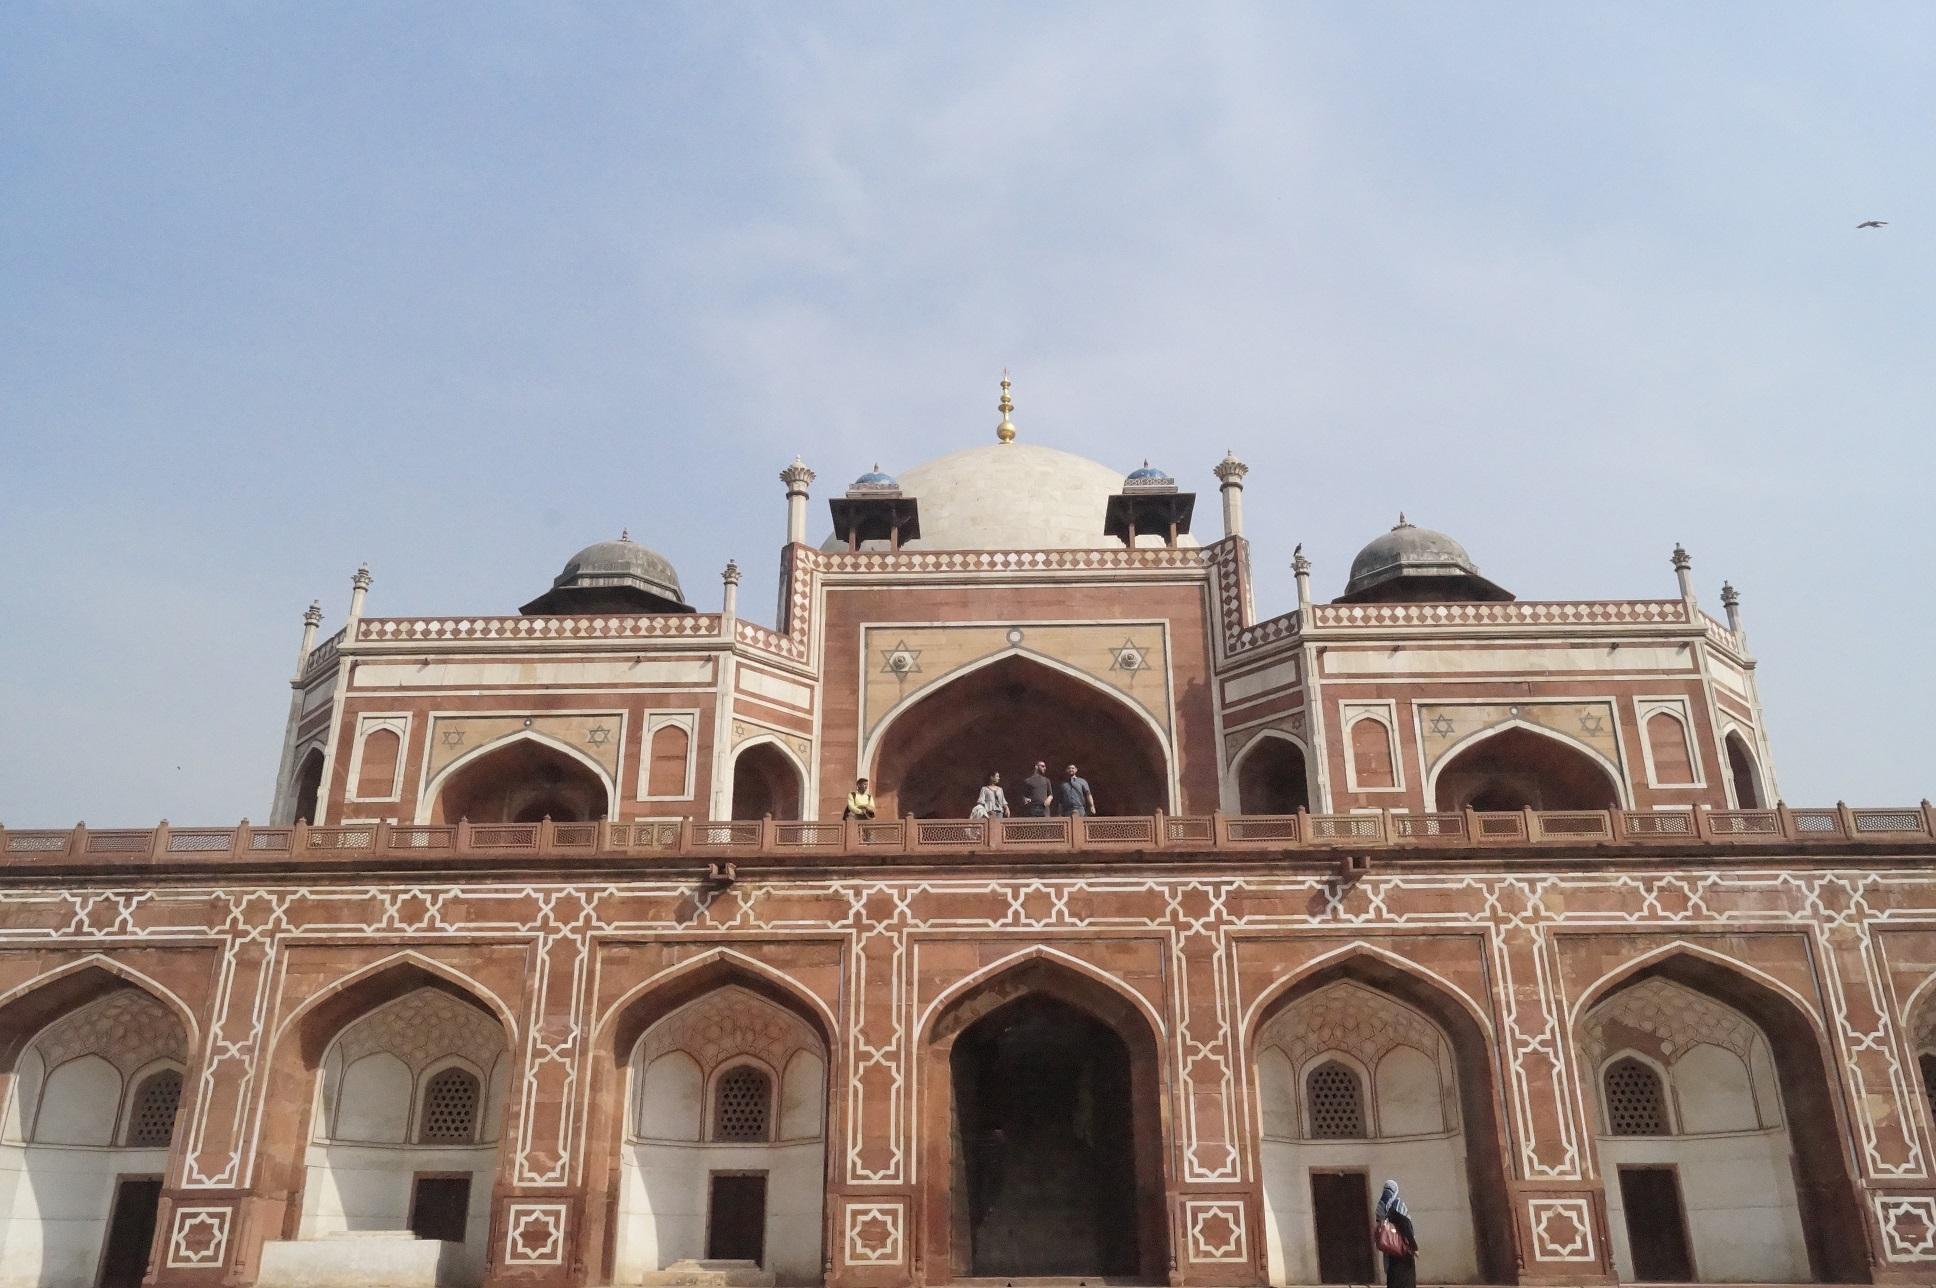 India Delhi Tumba Humayun - Ruta por el norte de la India de 3 semanas o 1 mes